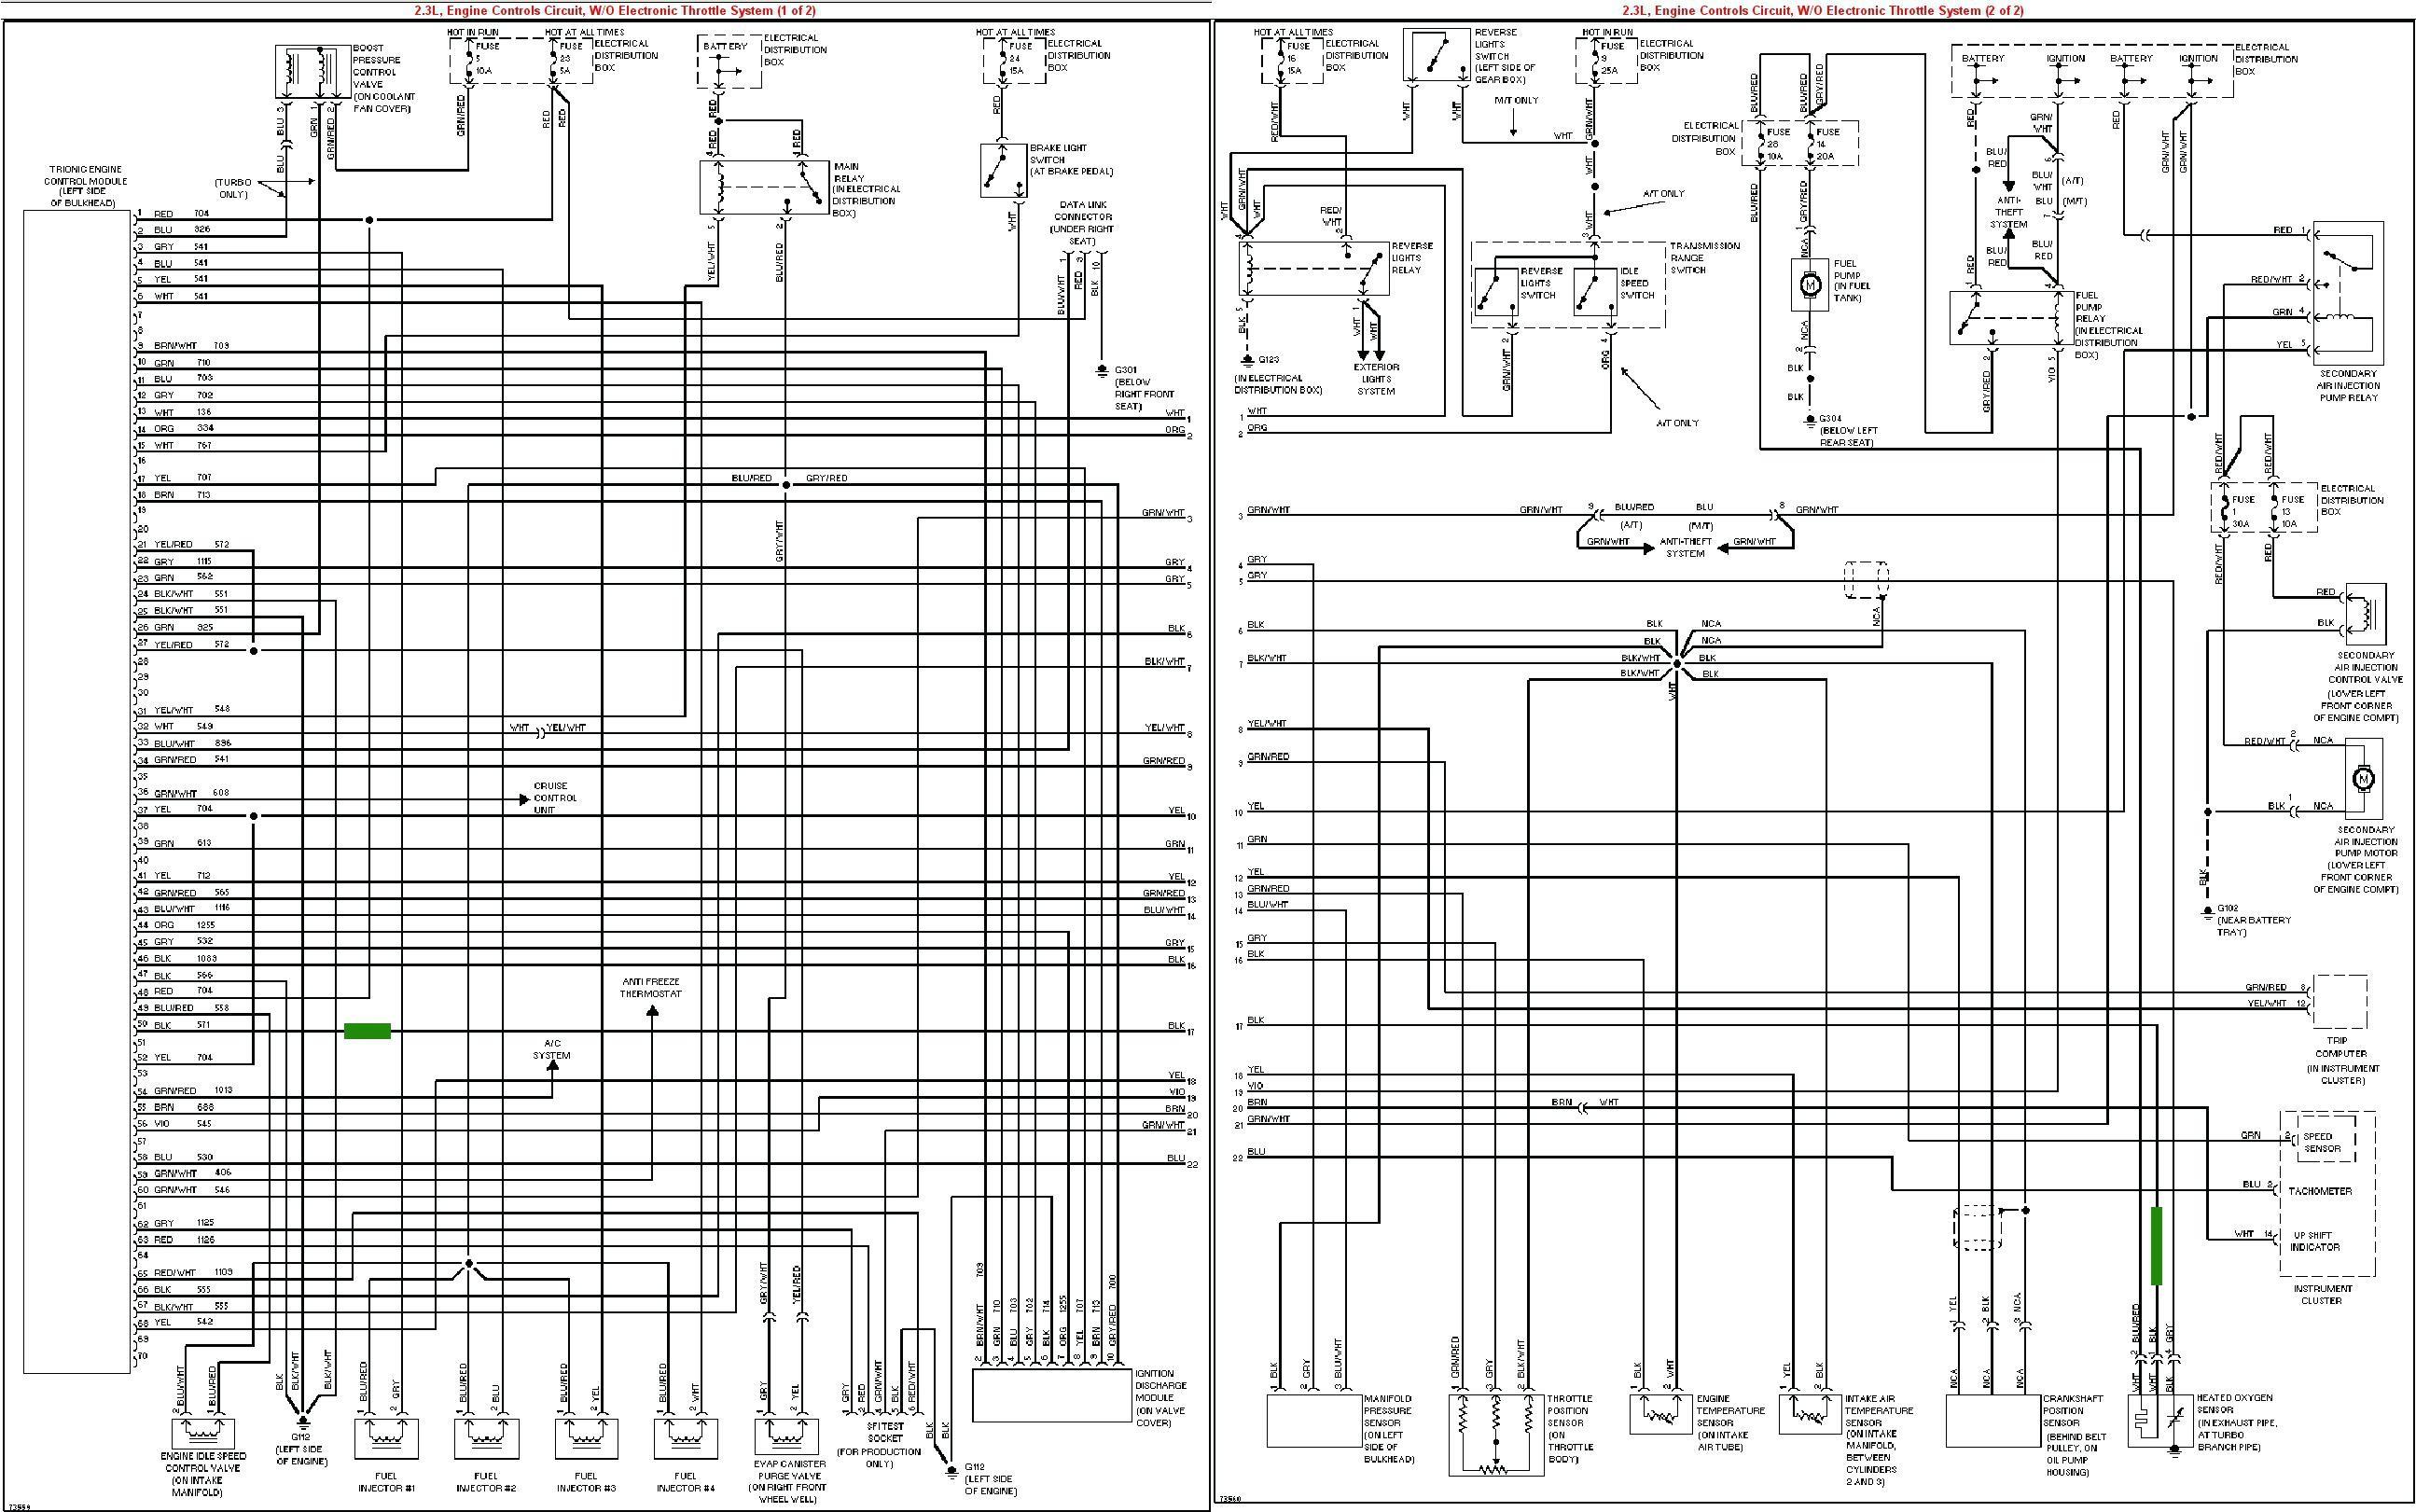 saab 9 5 wiring diagram elegant wiring diagram image rh mainetreasurechest com Interface Diagram Example Web Page Navigation Diagram